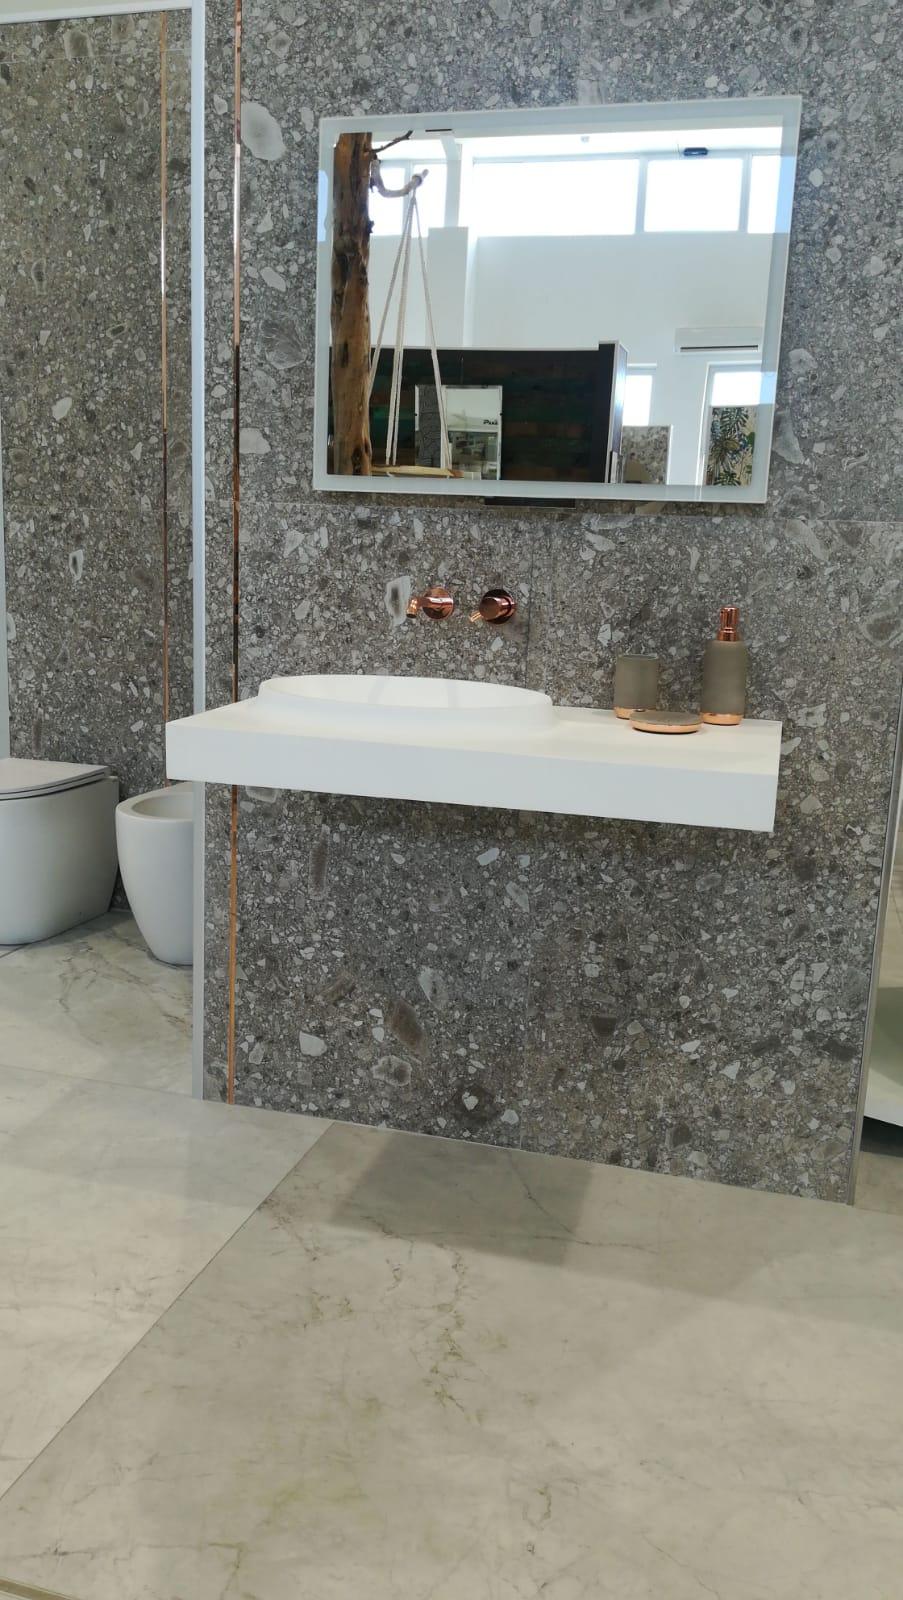 Arredo bagno mobili bagno box doccia olbia porto rotondo porto cervo arzachena san - Arredo bagno san bonifacio ...